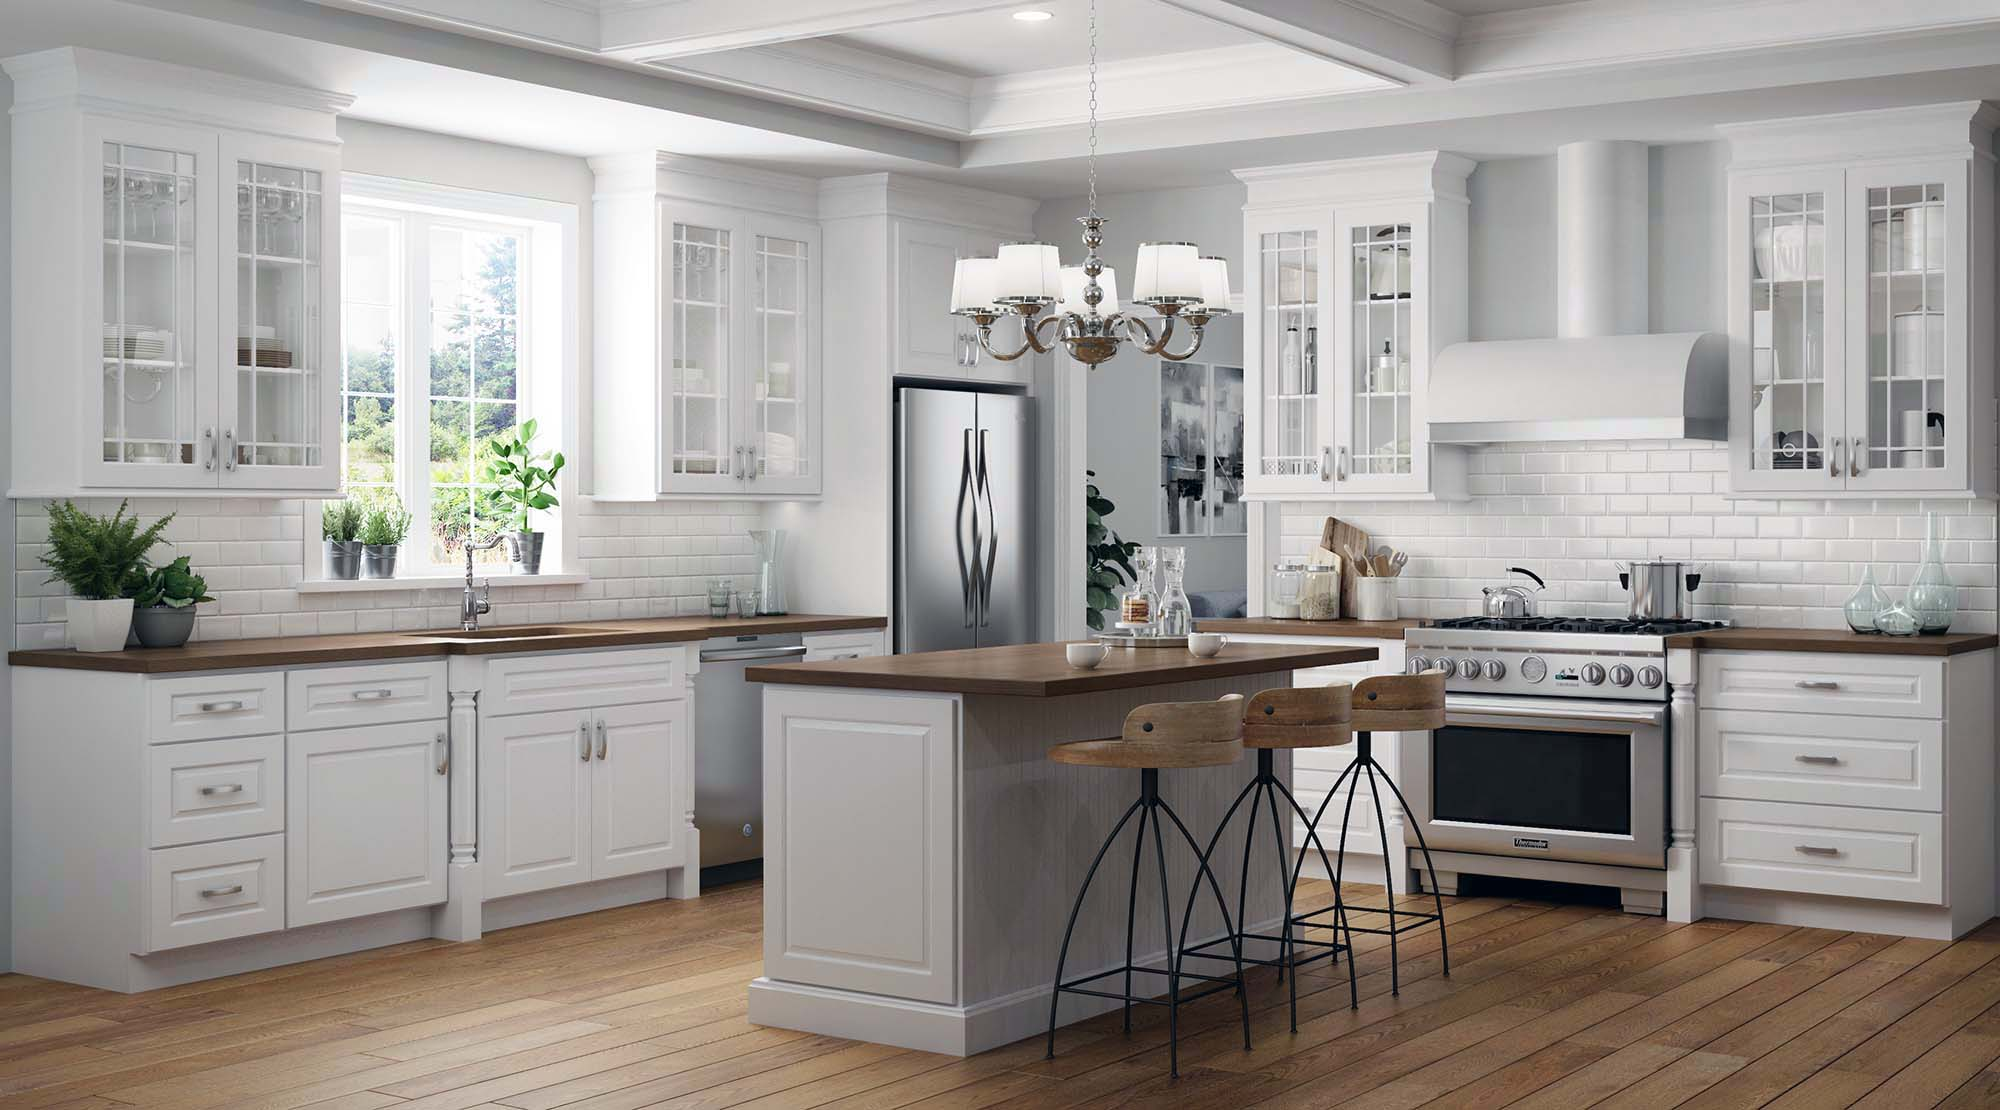 luxury kitchen design ideas white kitchen with wood countertops luxury home builder Gambrick NJ